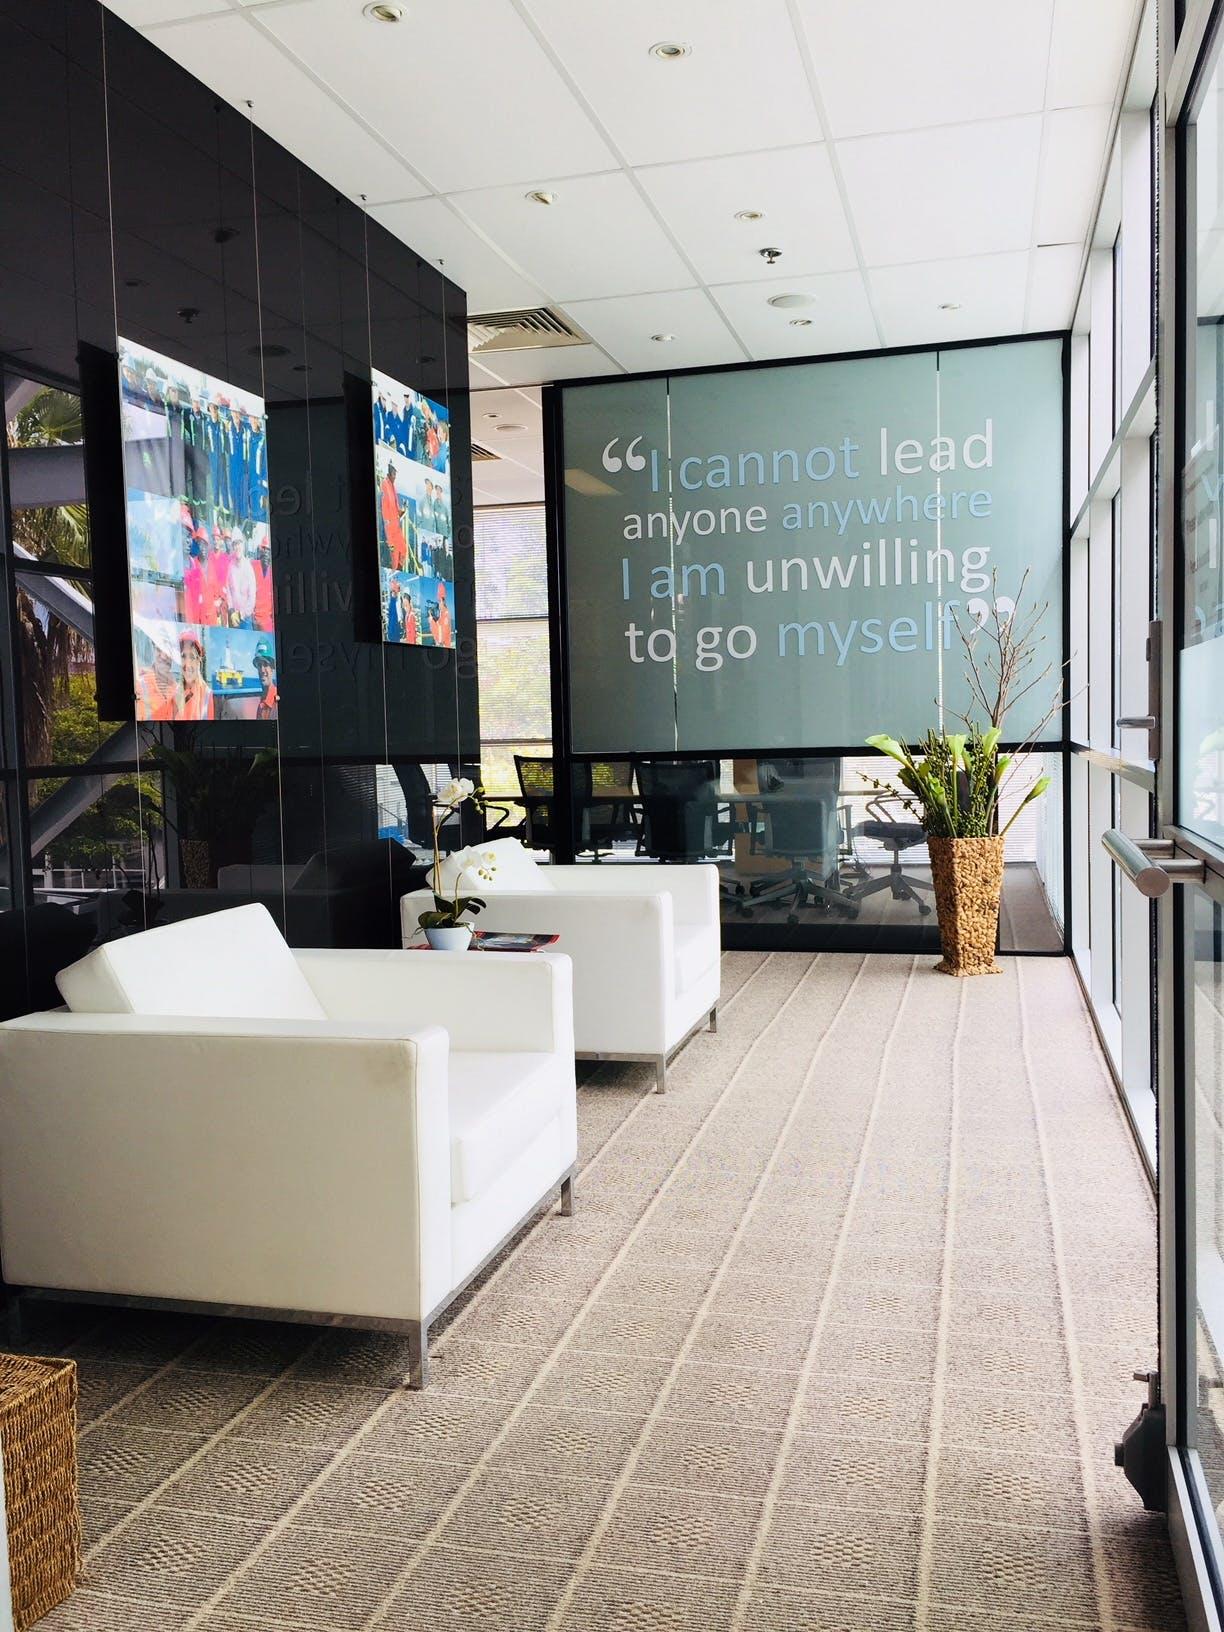 Board Room, meeting room at Brookvale Business, image 5